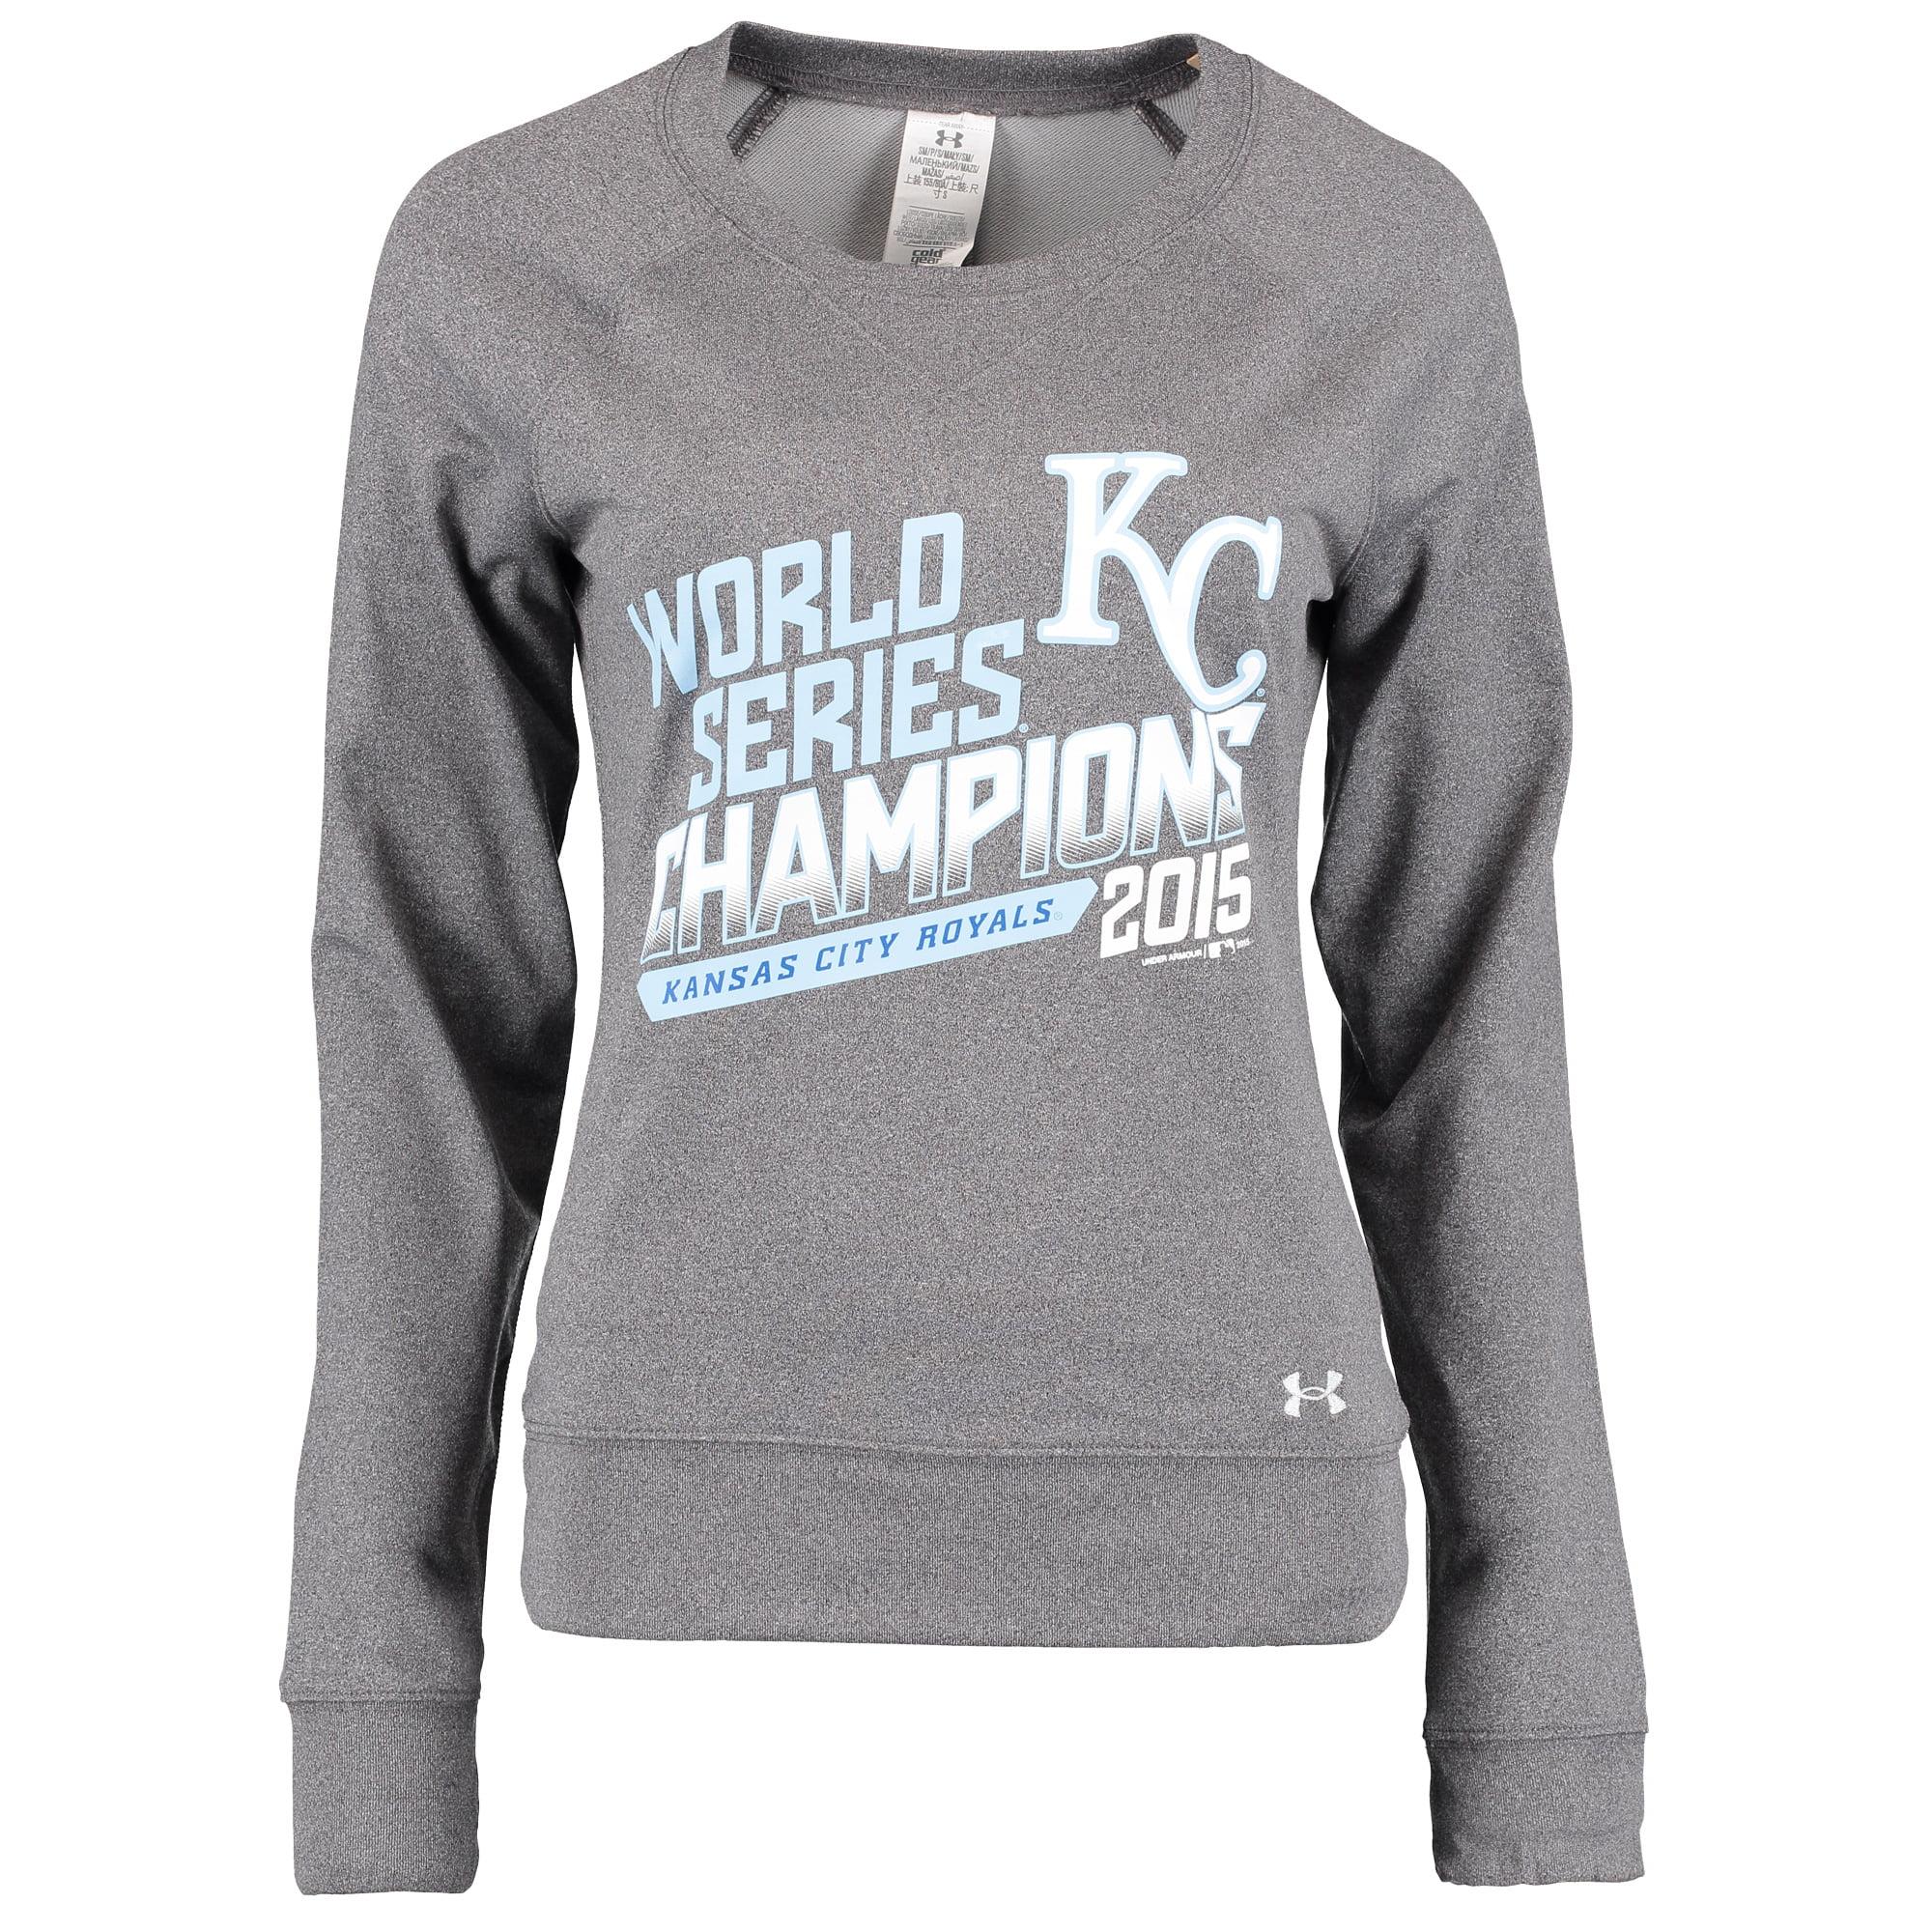 Kansas City Royals Under Armour Women's 2015 World Series Champions Pullover Sweatshirt - Gray - XL